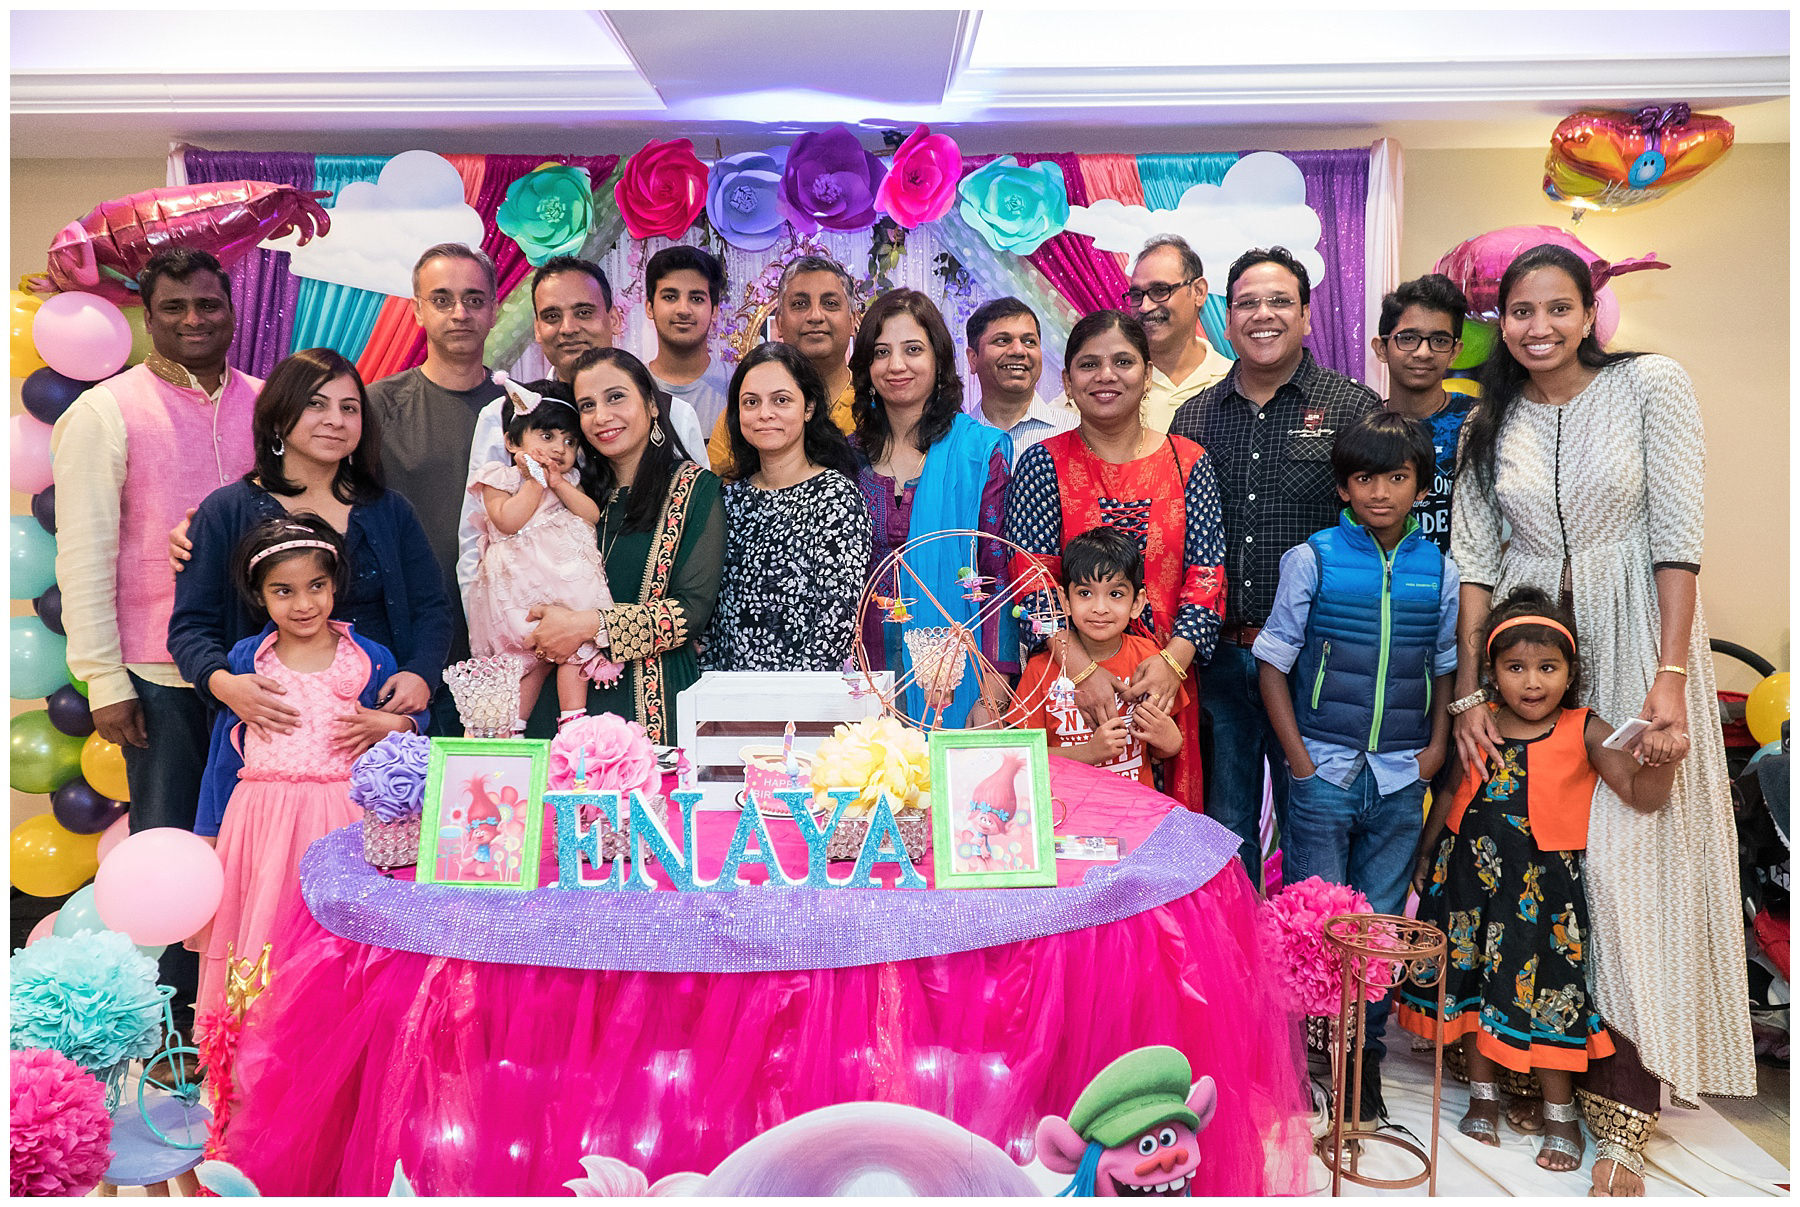 deewan-banquet-piscataway-nj-birthday-enanya-birthday-28.jpg